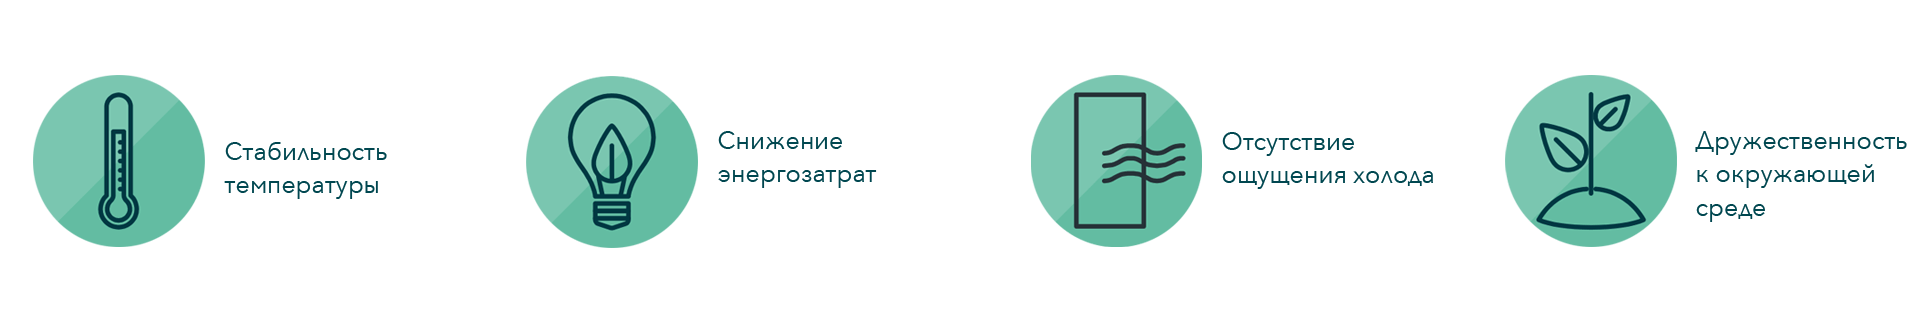 Benefits of dual air curtain, illustration, RU, FREOR